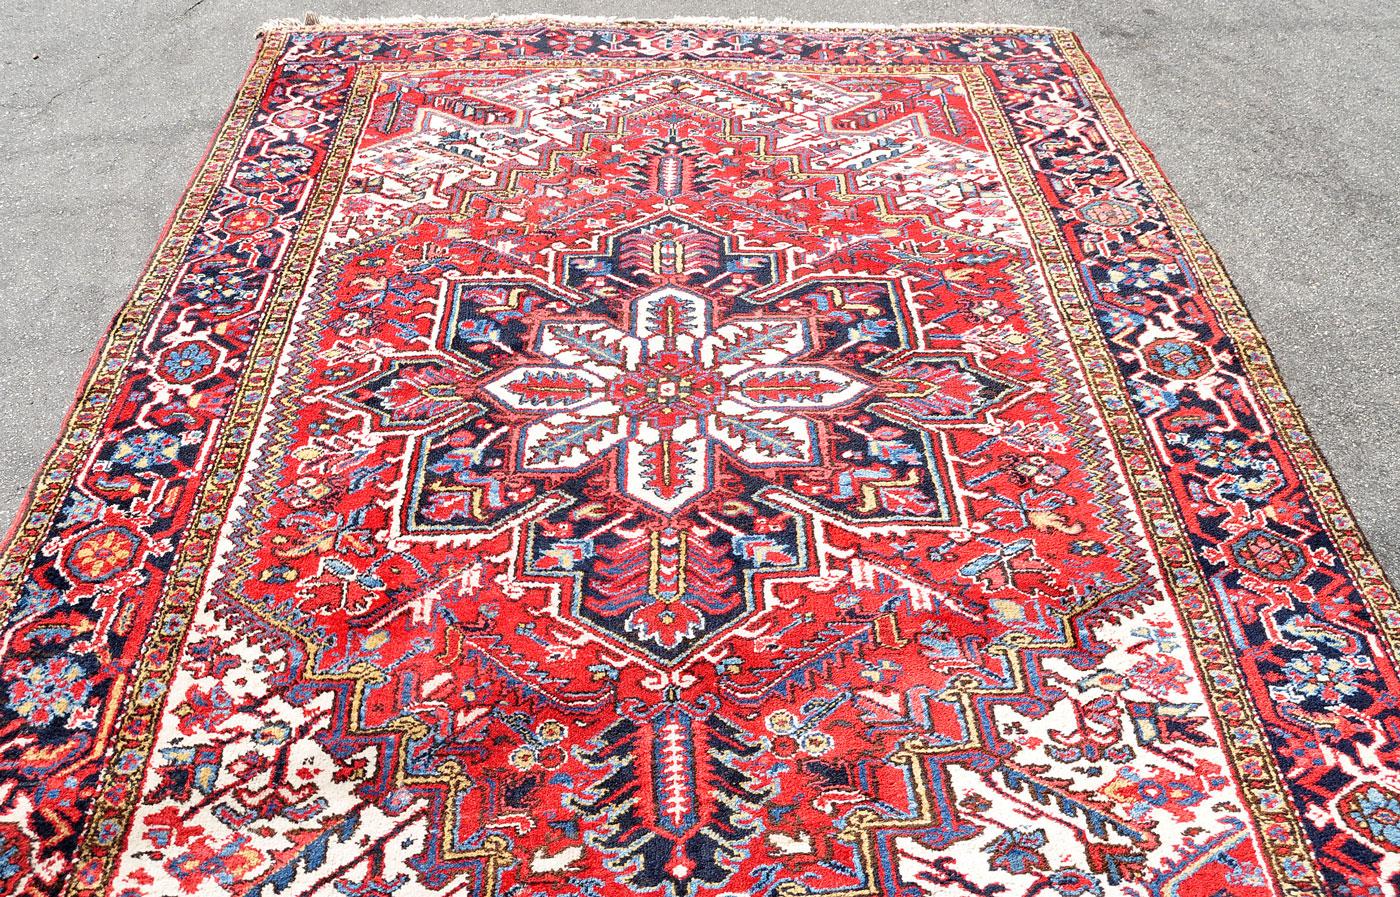 Heriz Carpet from NW Iran